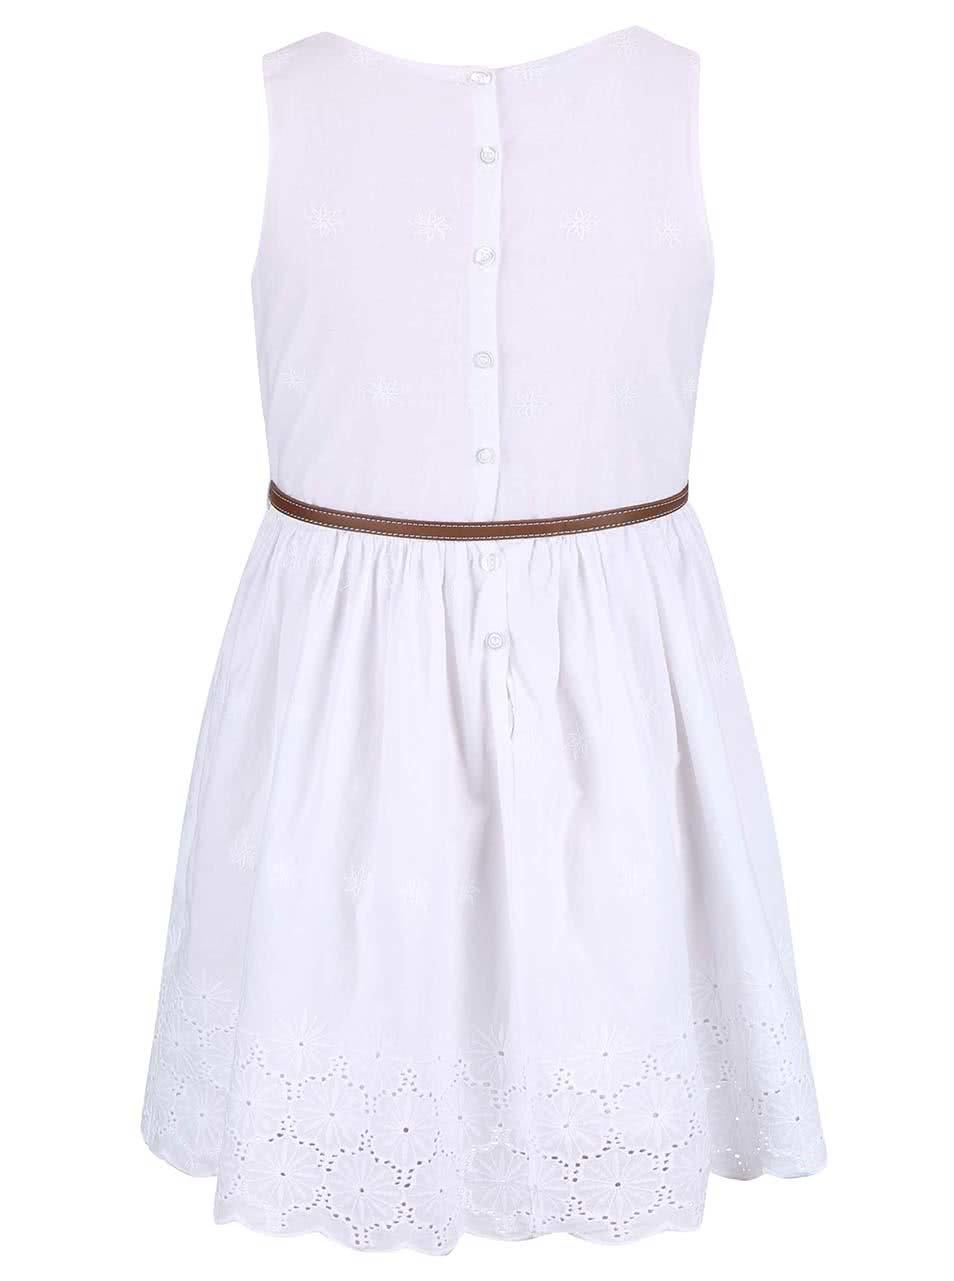 Biele dievčenské šaty s opaskom name it Gimola ... 094c5bb809c